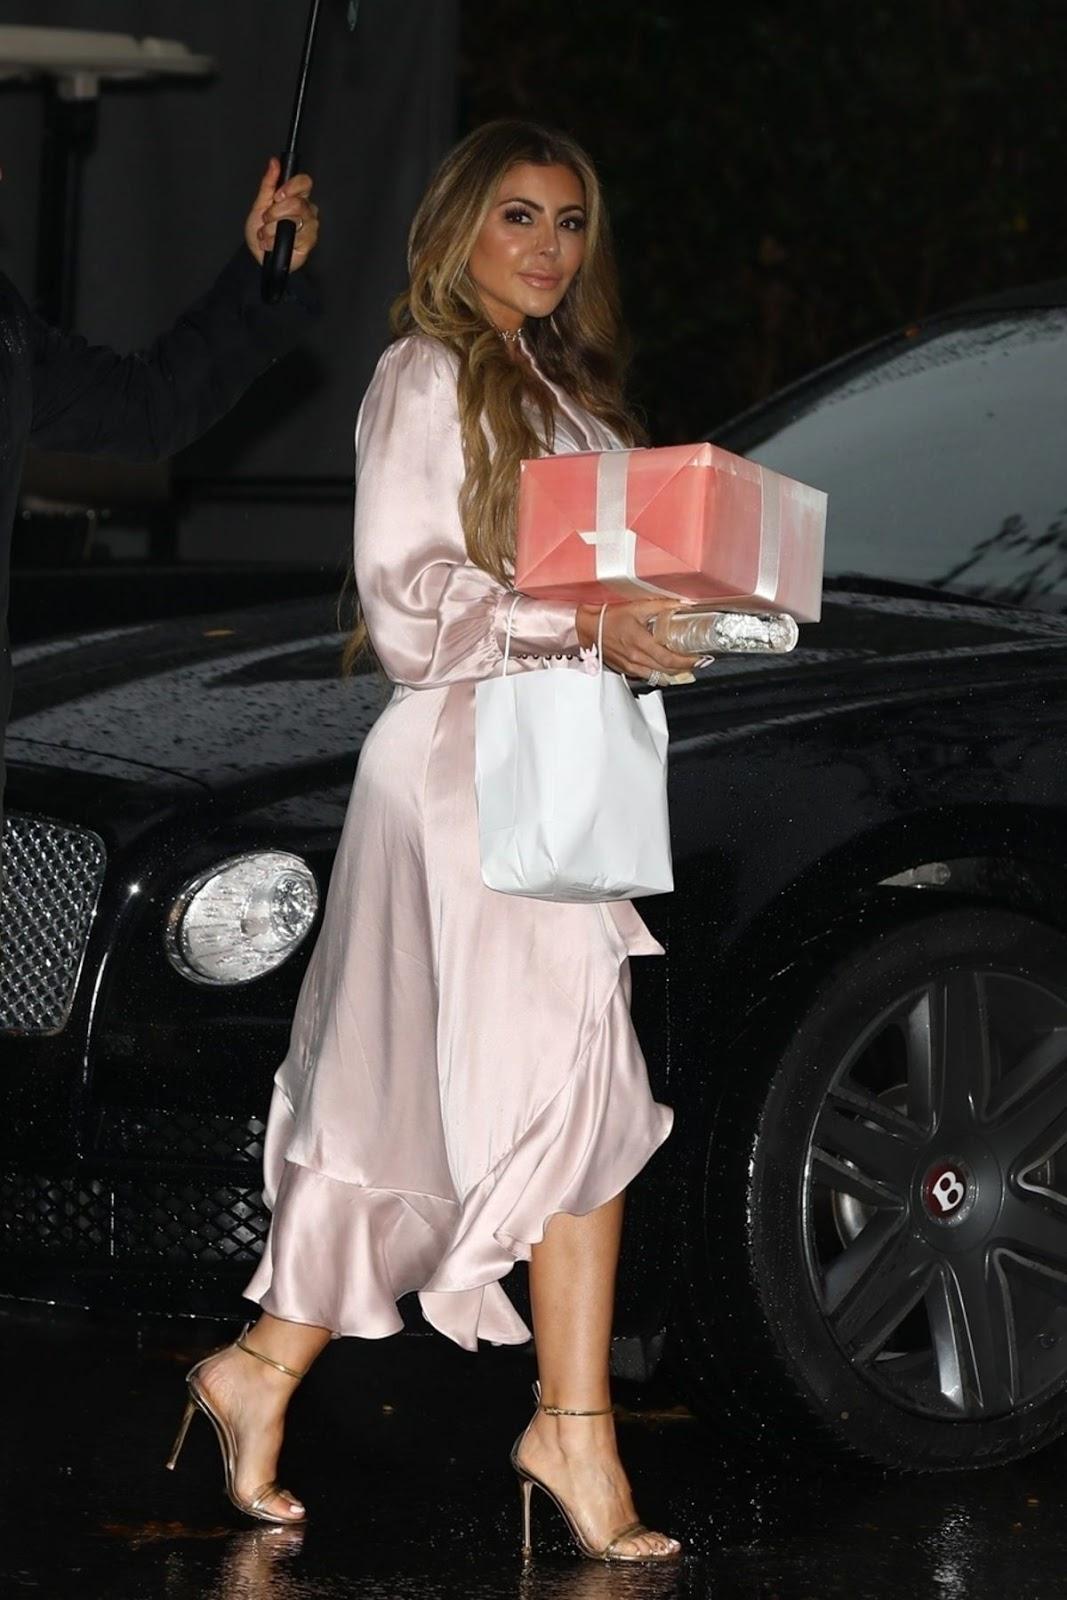 larsa pippen arrives at khloe kardashian's baby shower in bel air